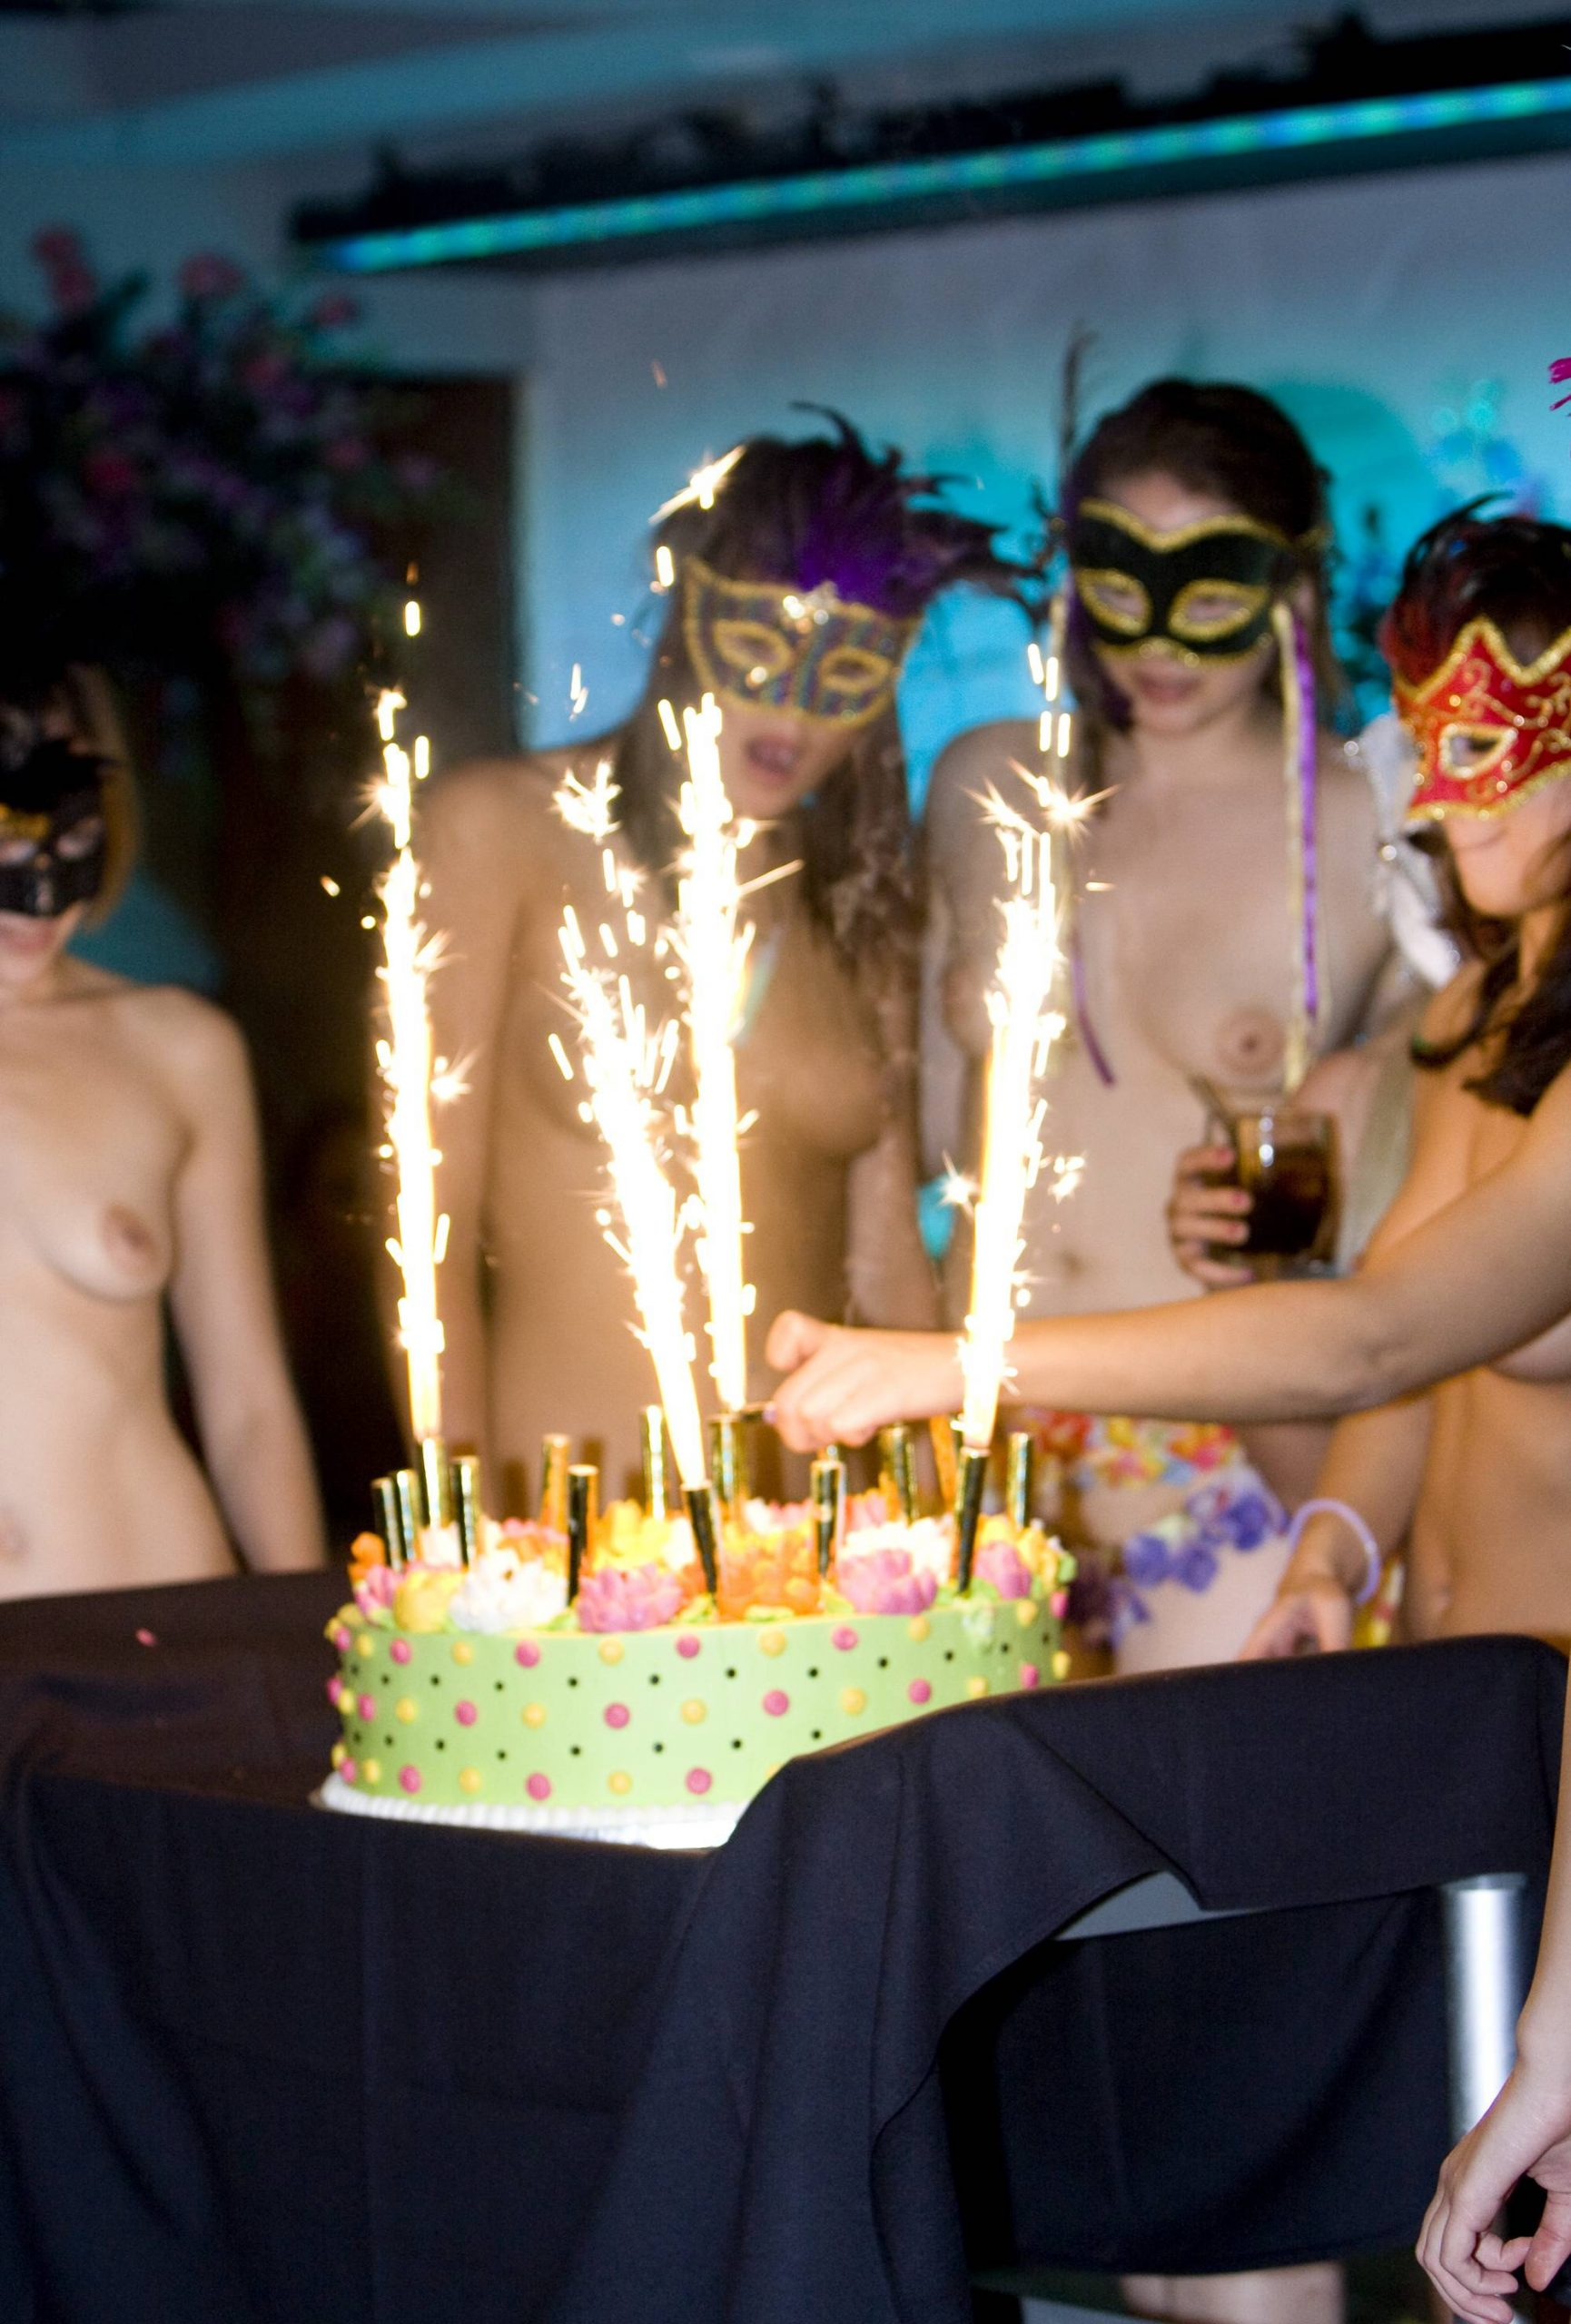 Purenudism Images-Masquerade Cake Eating - 1